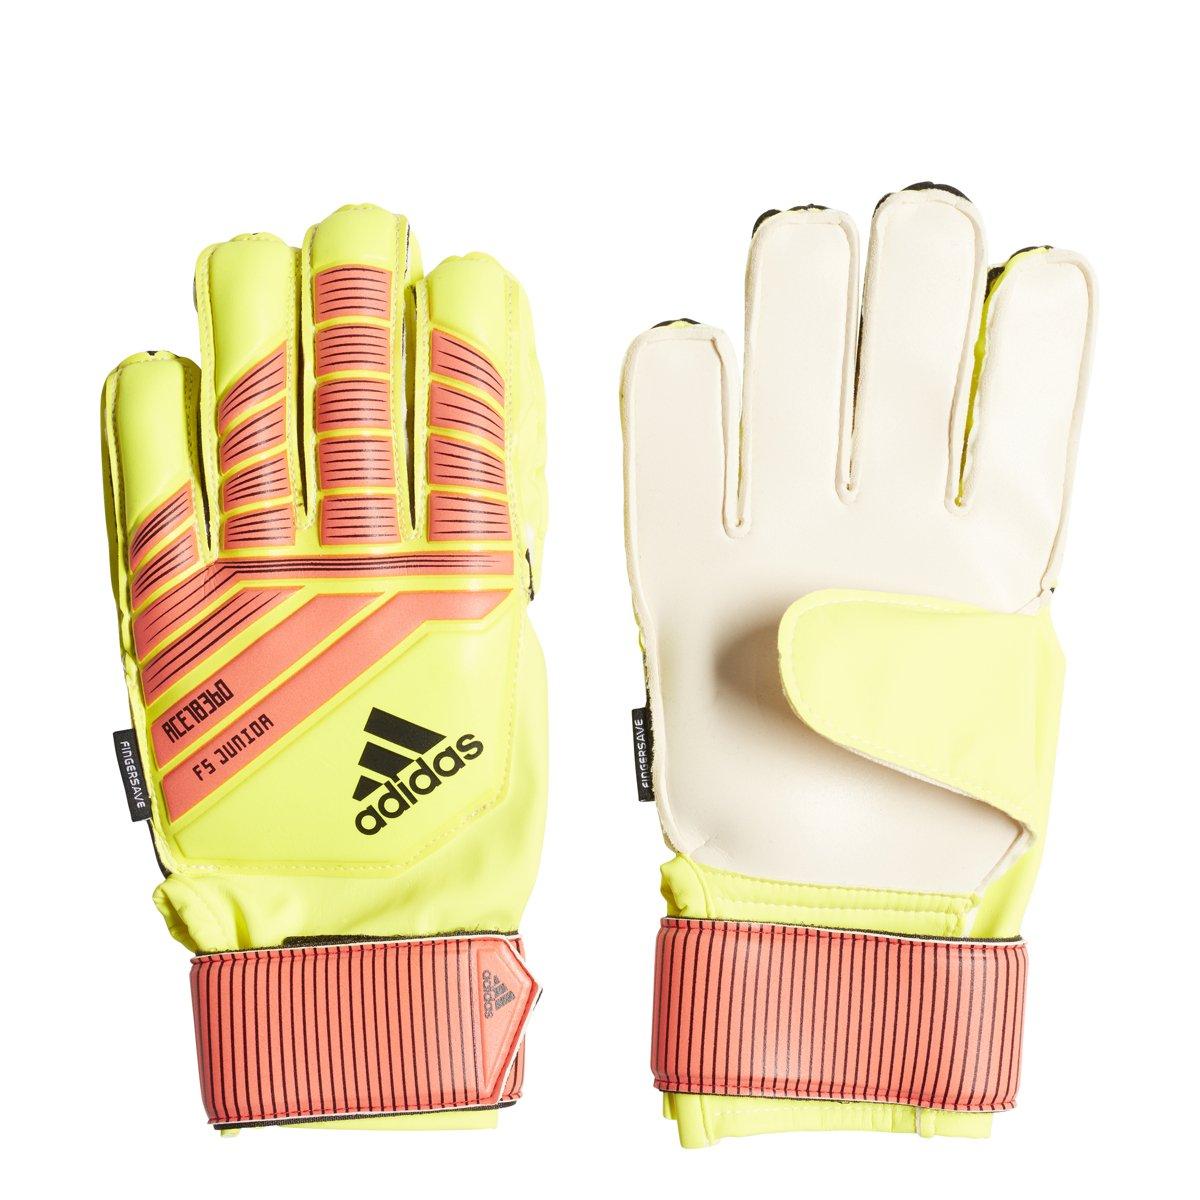 Adidas Predator Fingersaveジュニアサッカー手袋 B0788D57LH Size 7|Solar Yellow/Solar Red/Black Solar Yellow/Solar Red/Black Size 7